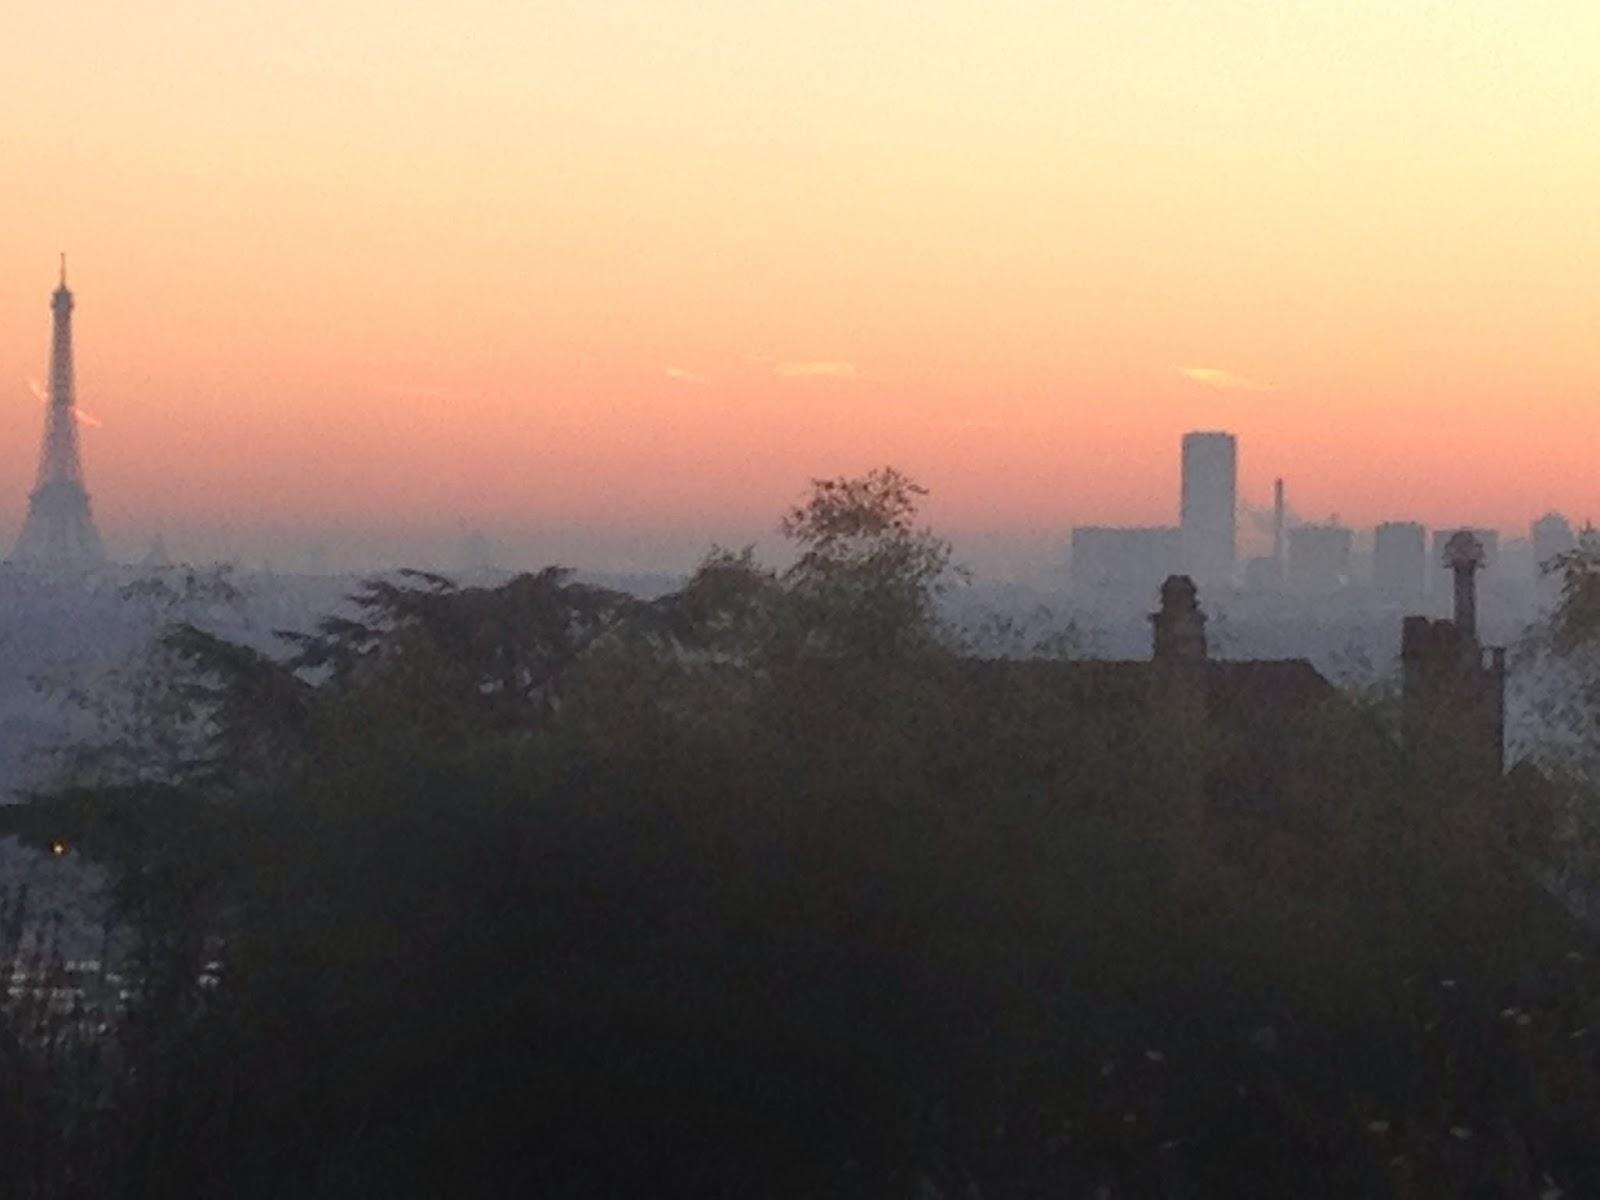 sunrise over paris 1 january 2015